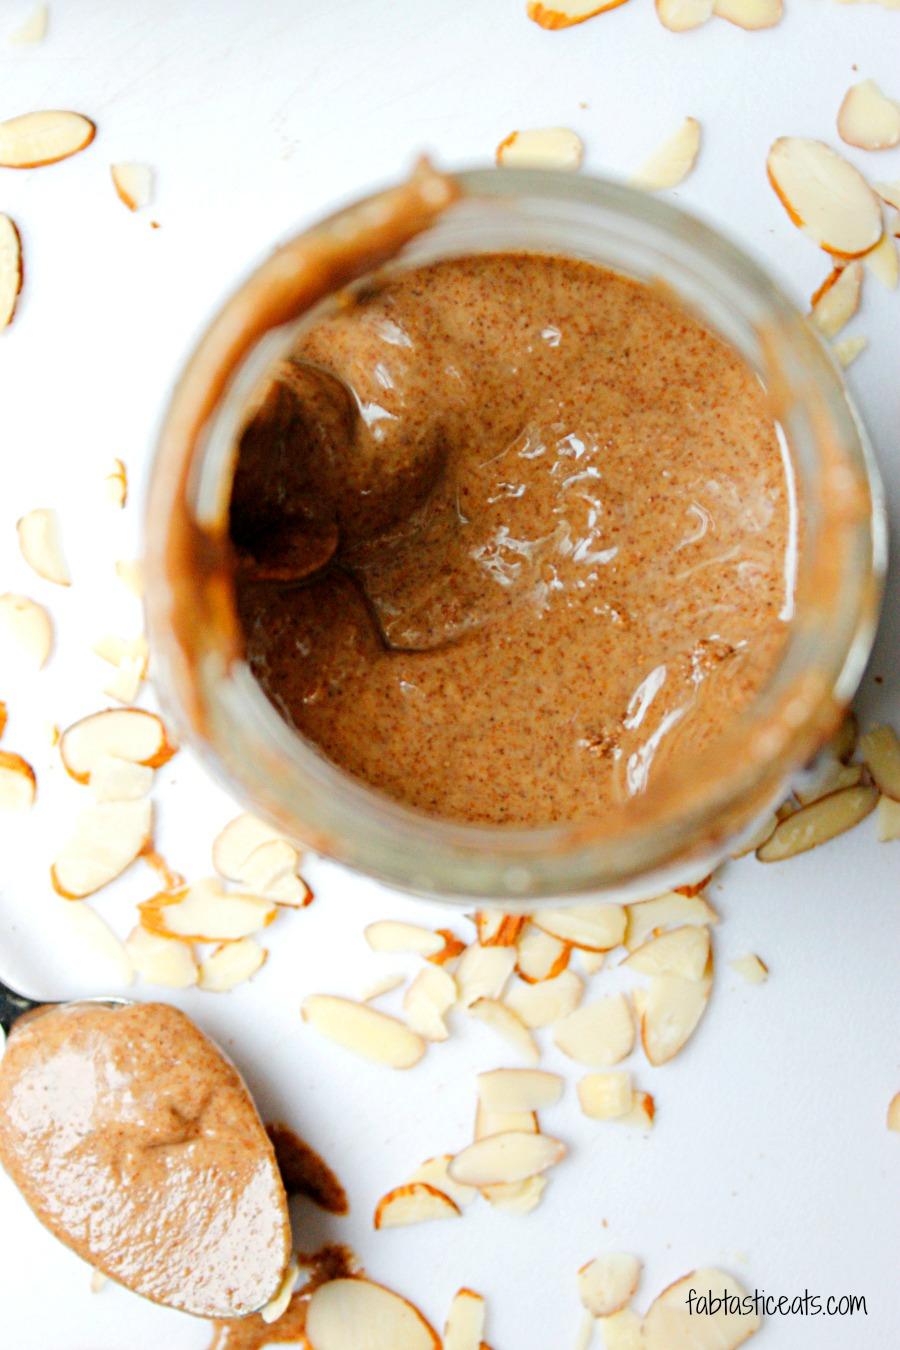 Cinnamon Almond Butter | Fabtastic Eats